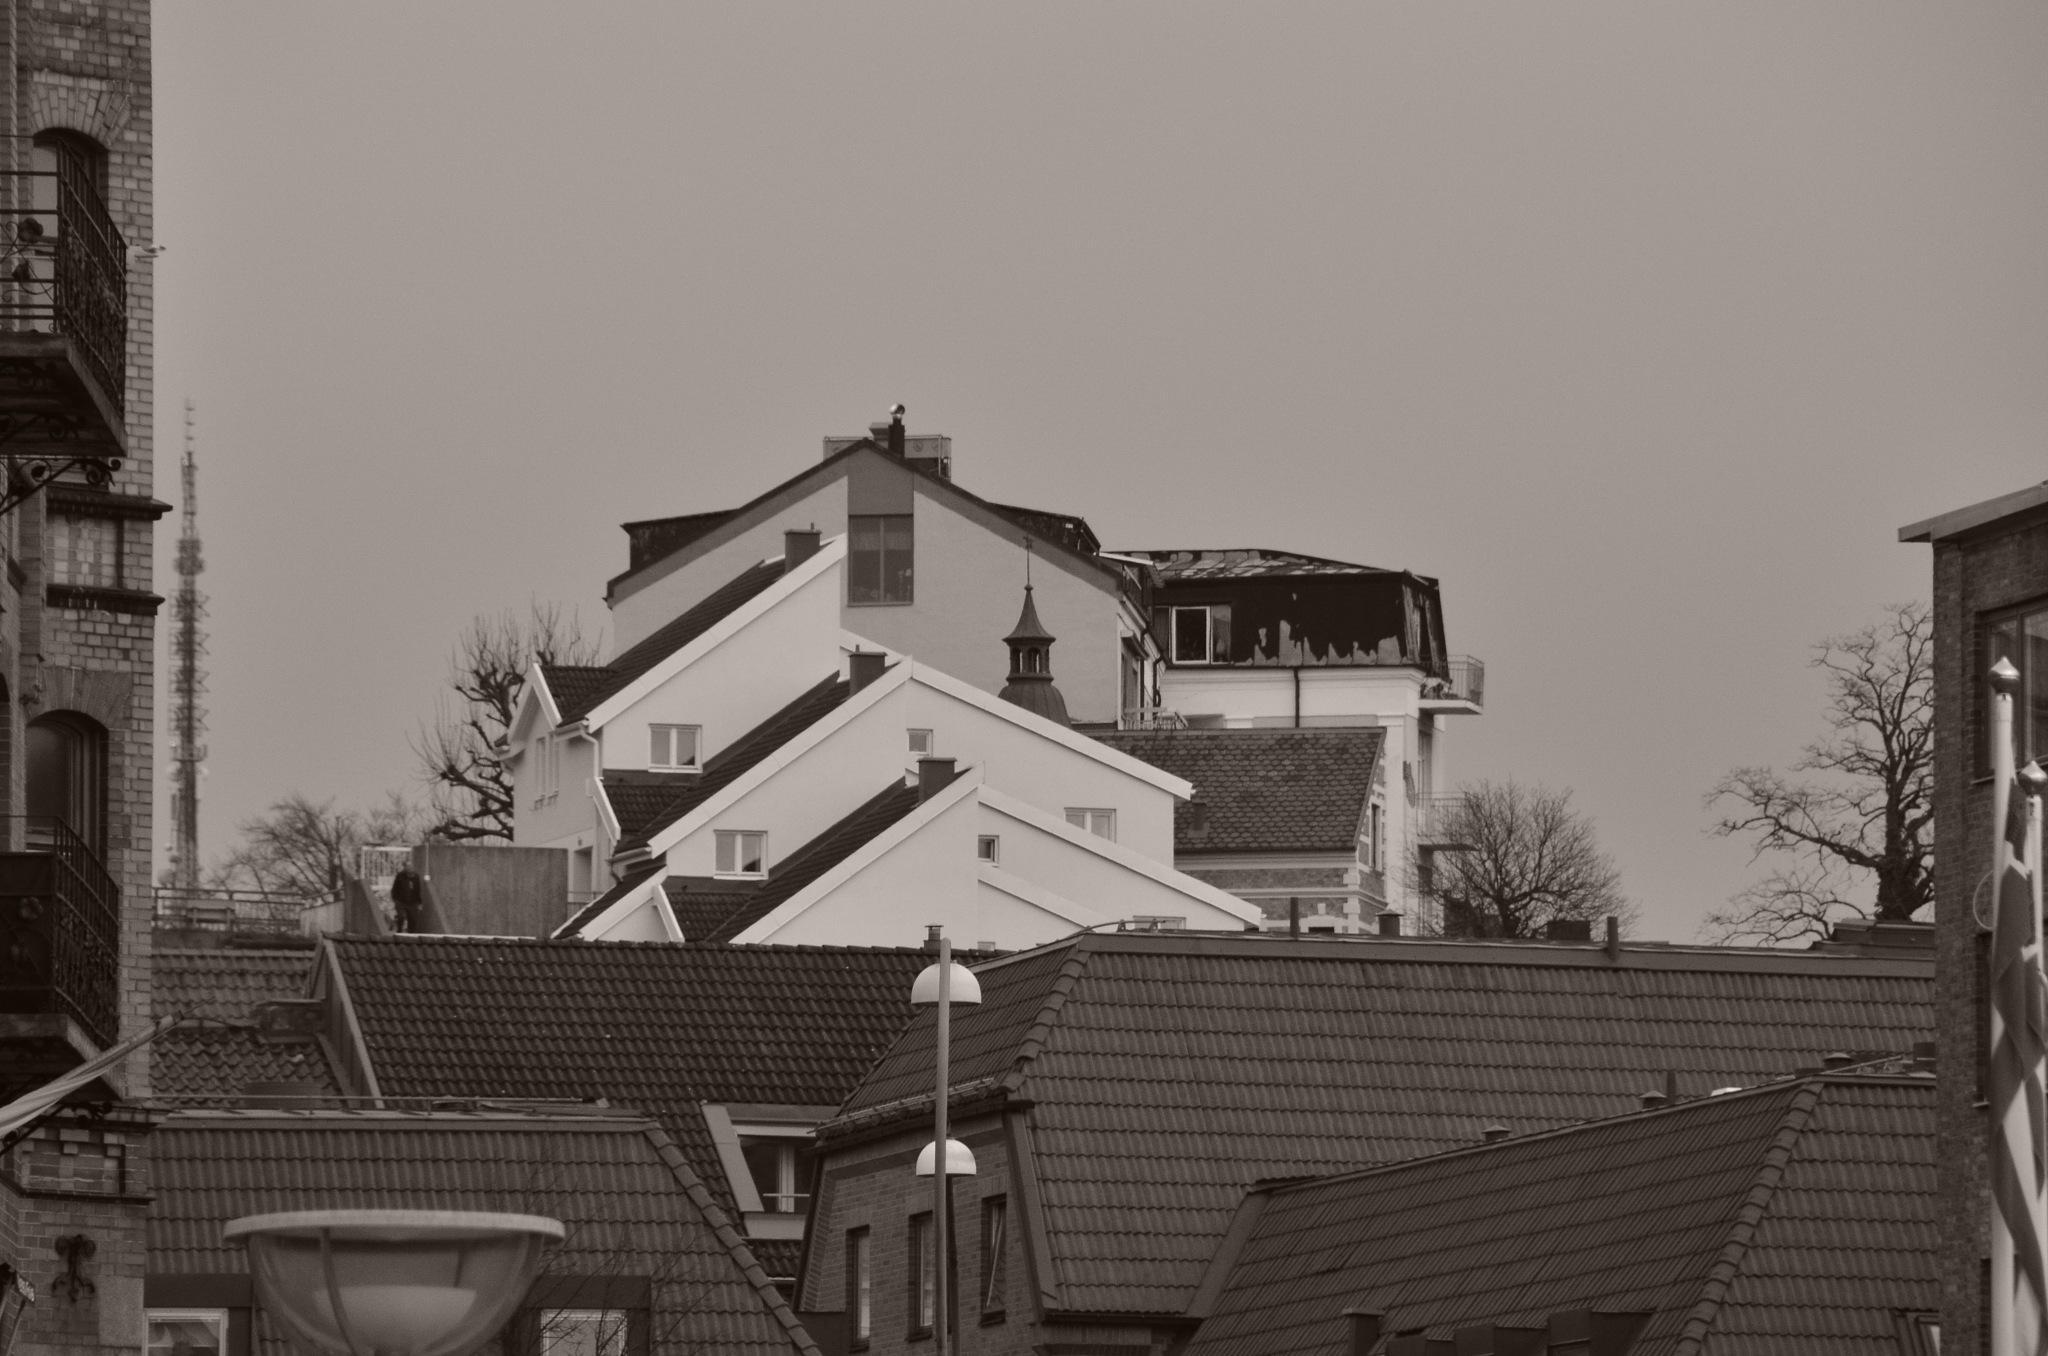 hus gavlar by Max Cesare Parodi